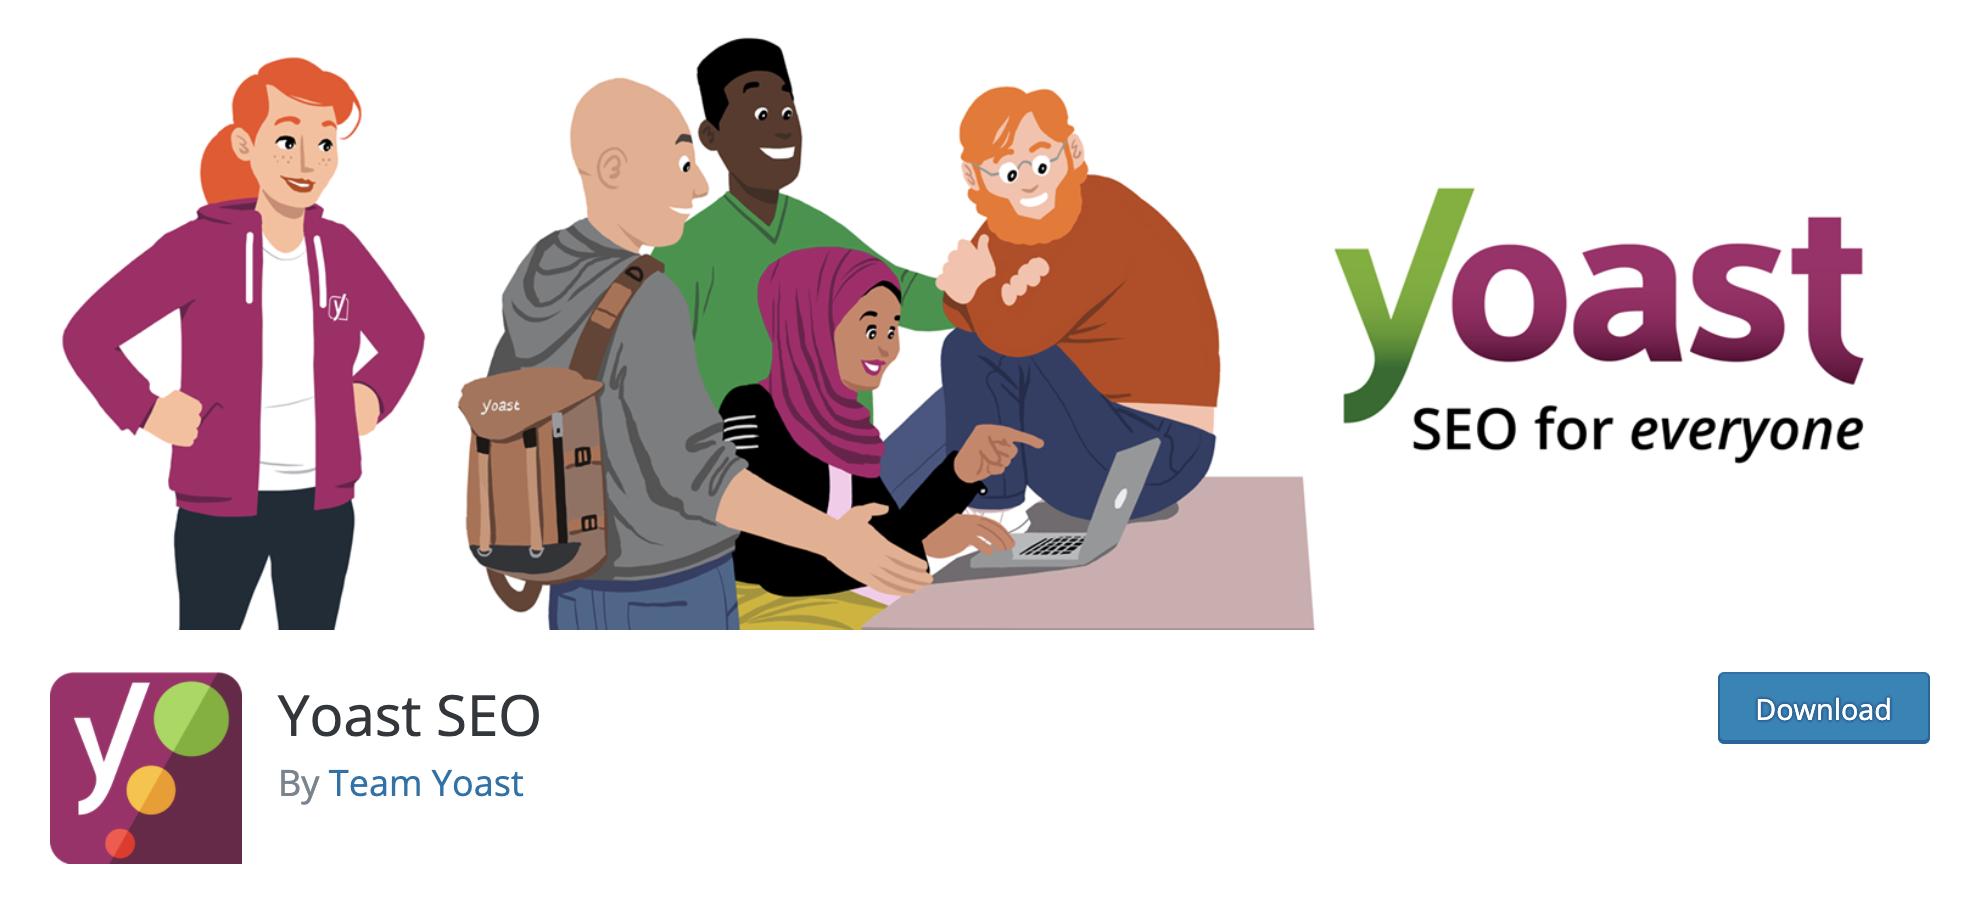 Yeost SEO WordPress multisite plugin